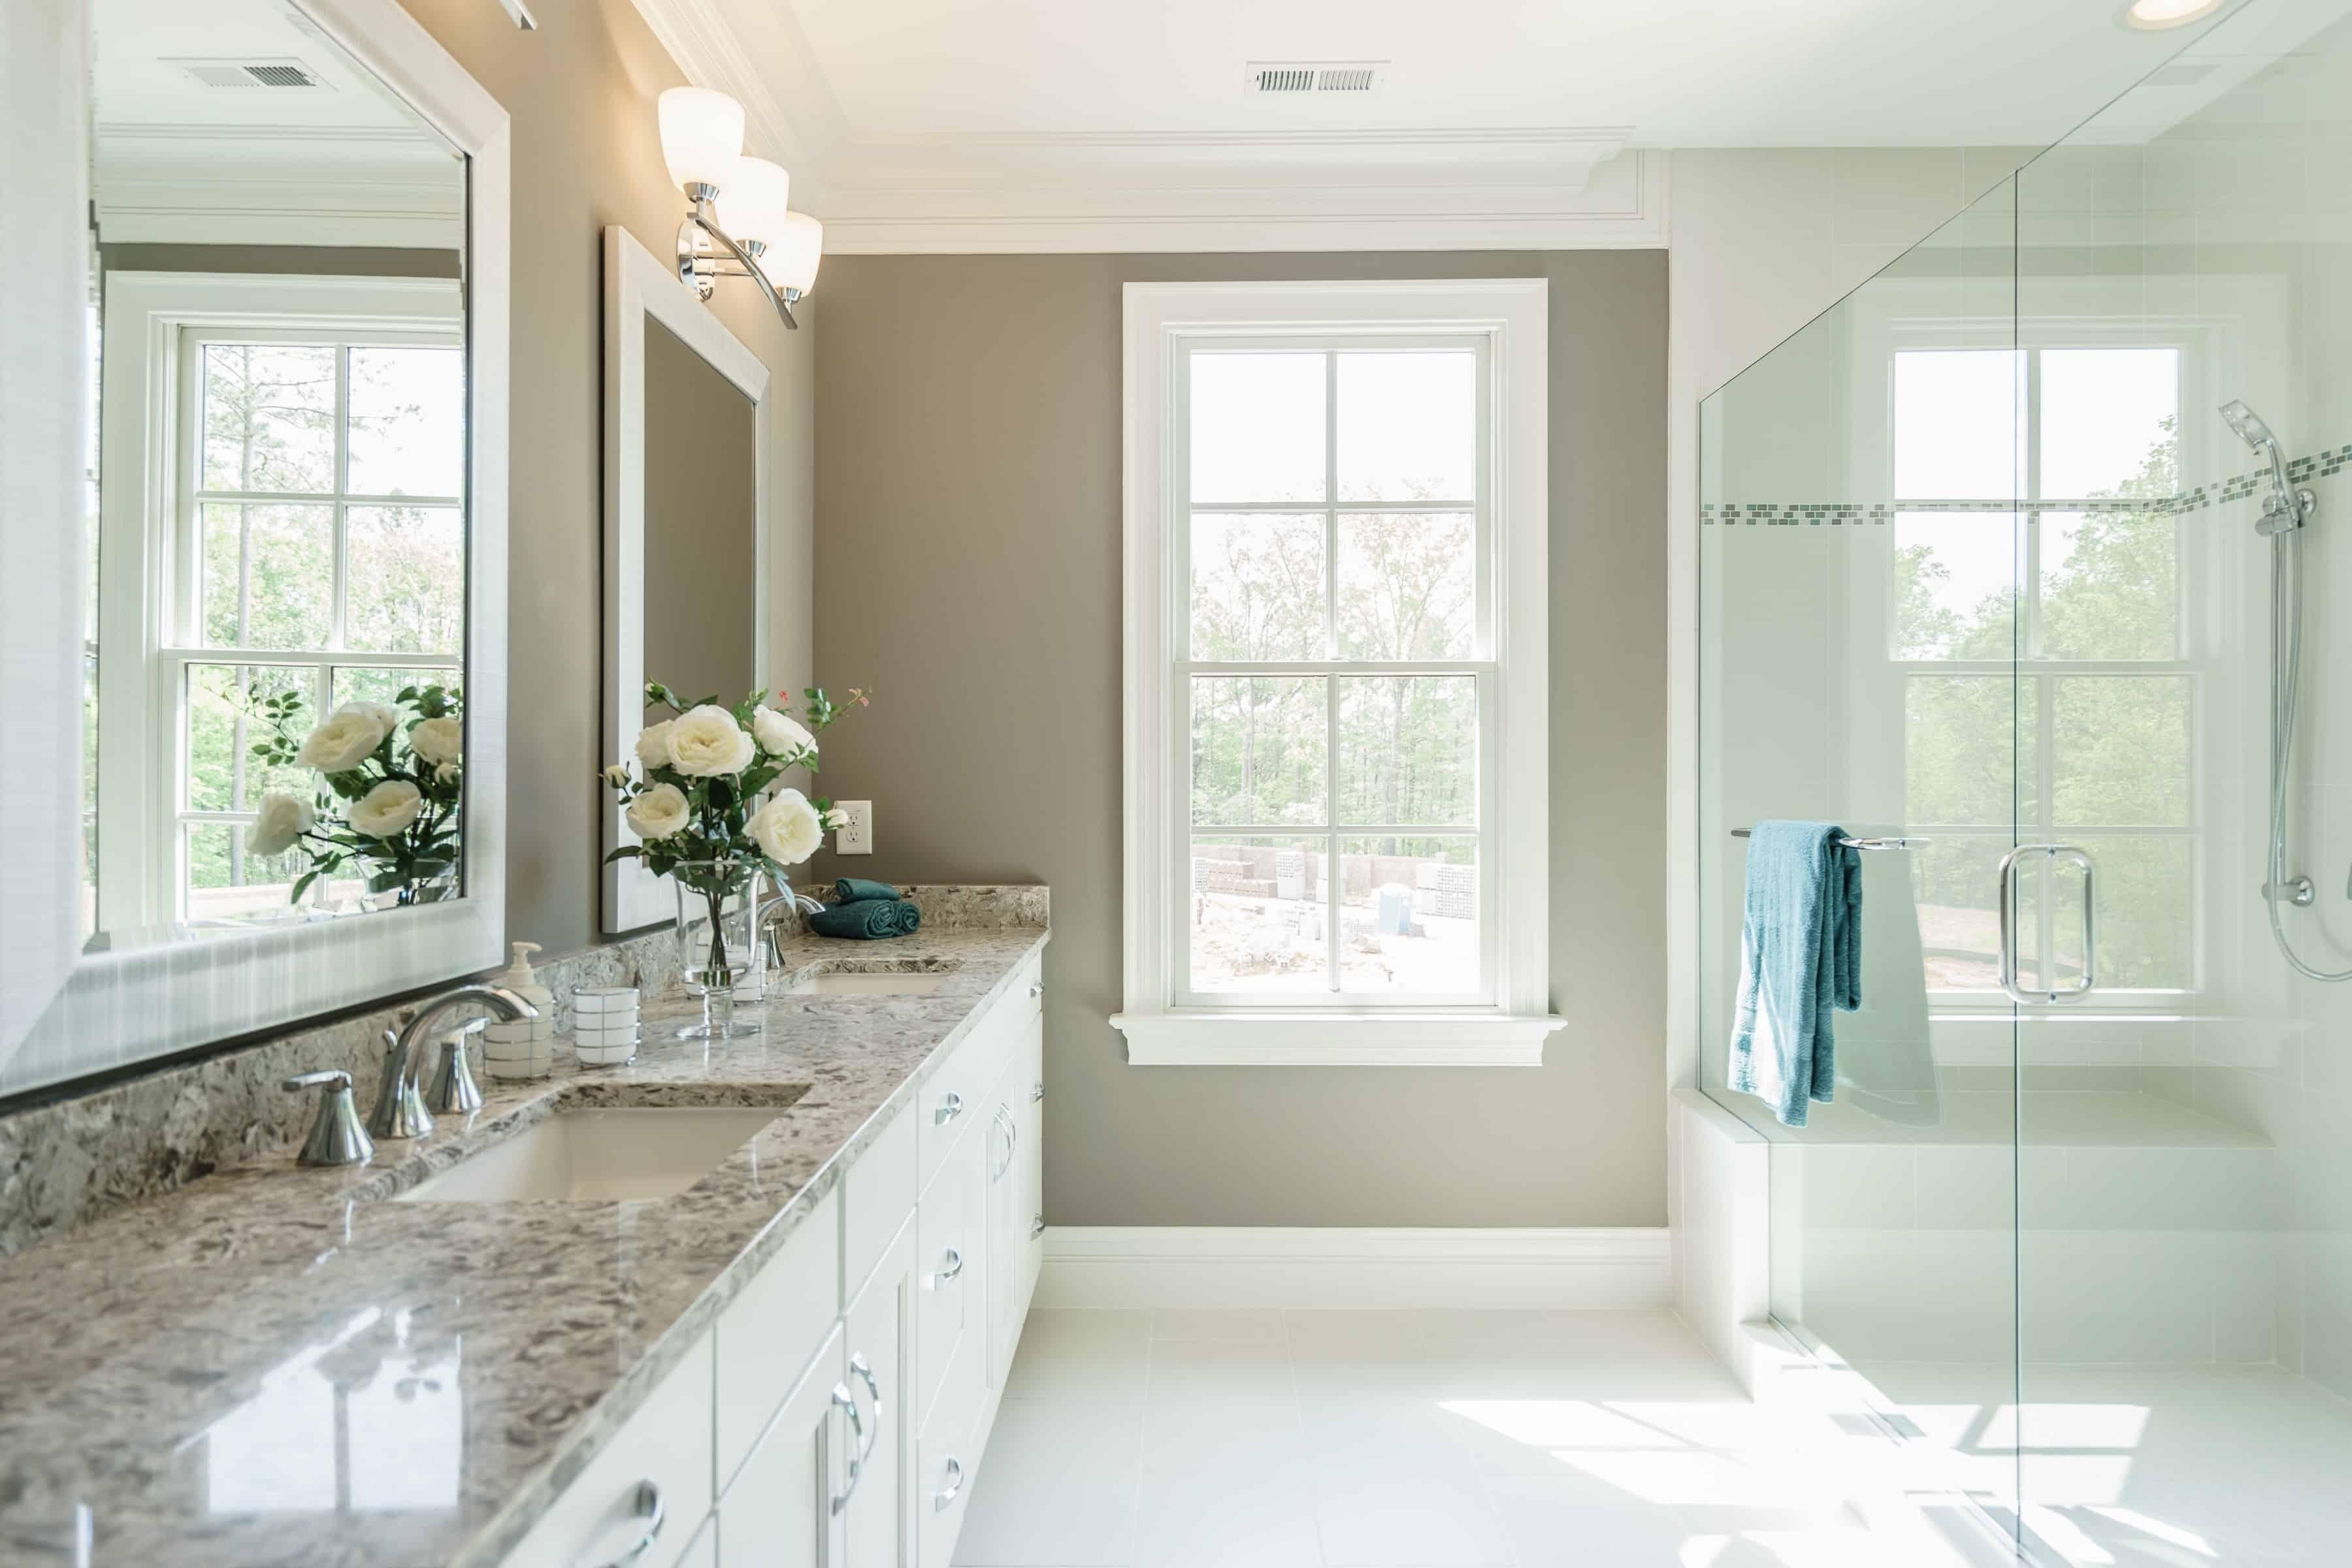 Bathroom By Luxury Real Estate Developer